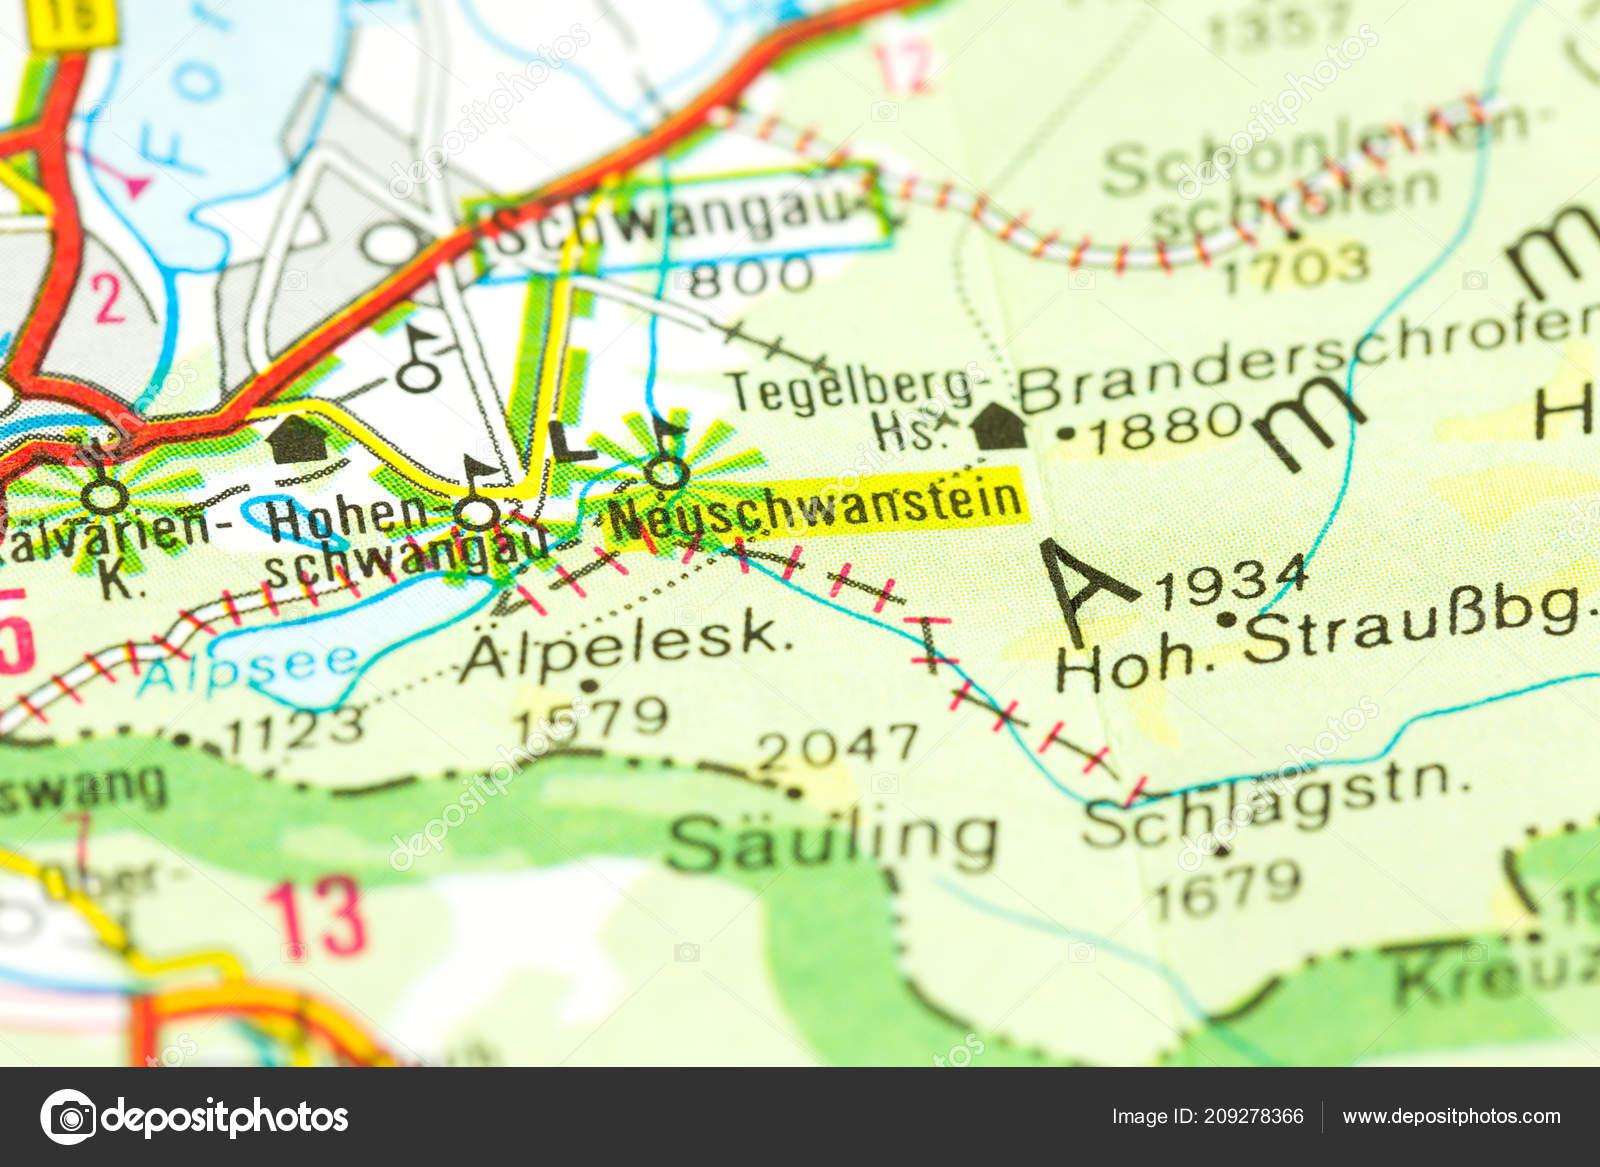 New Swanstone Castle Map Bavaria Germany Stock Photo